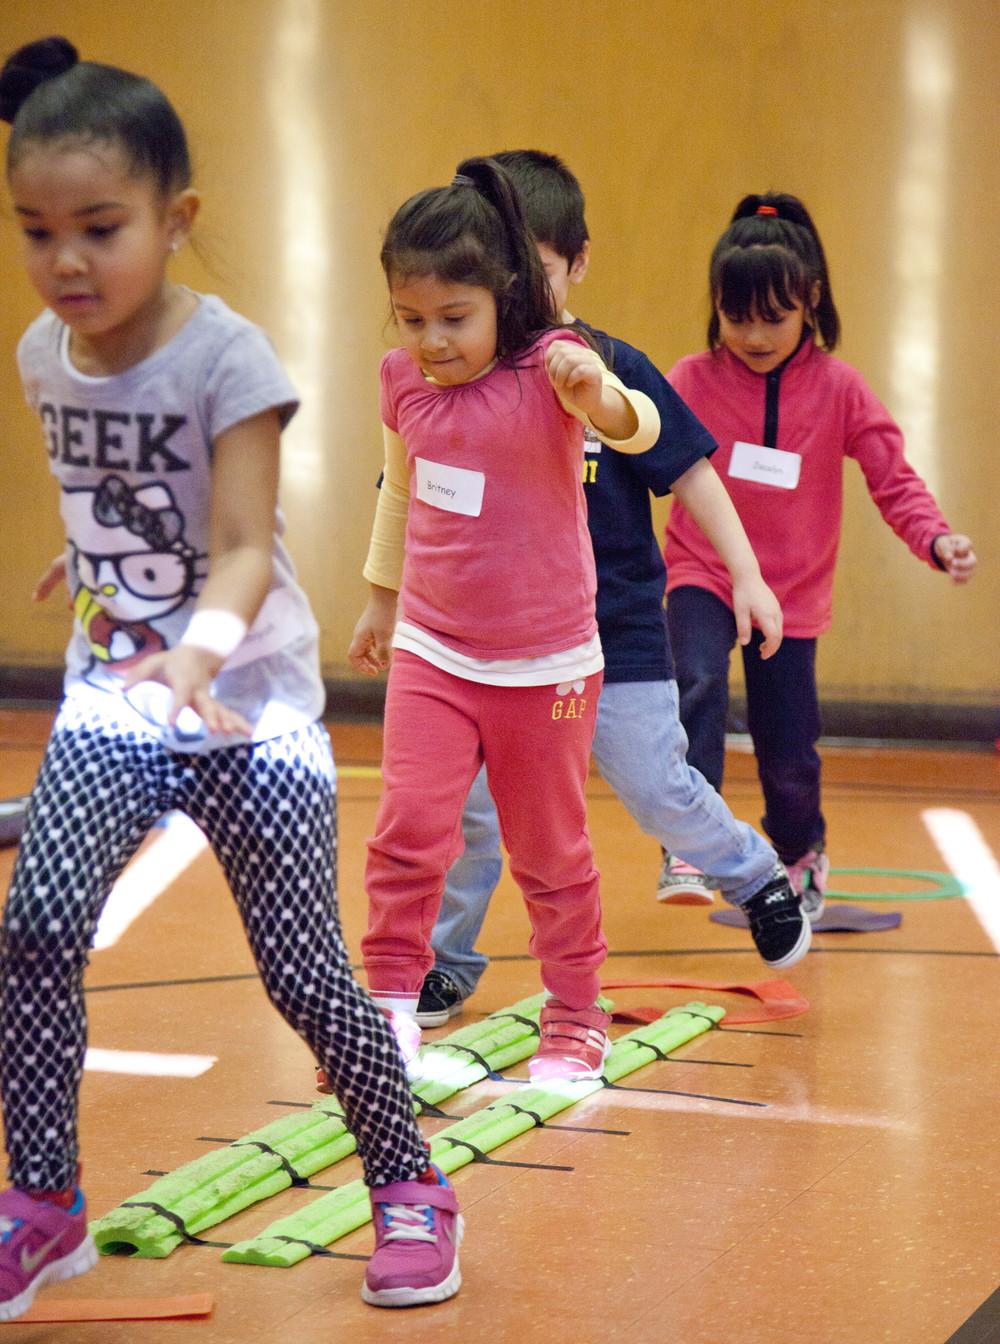 Kids-training.jpg